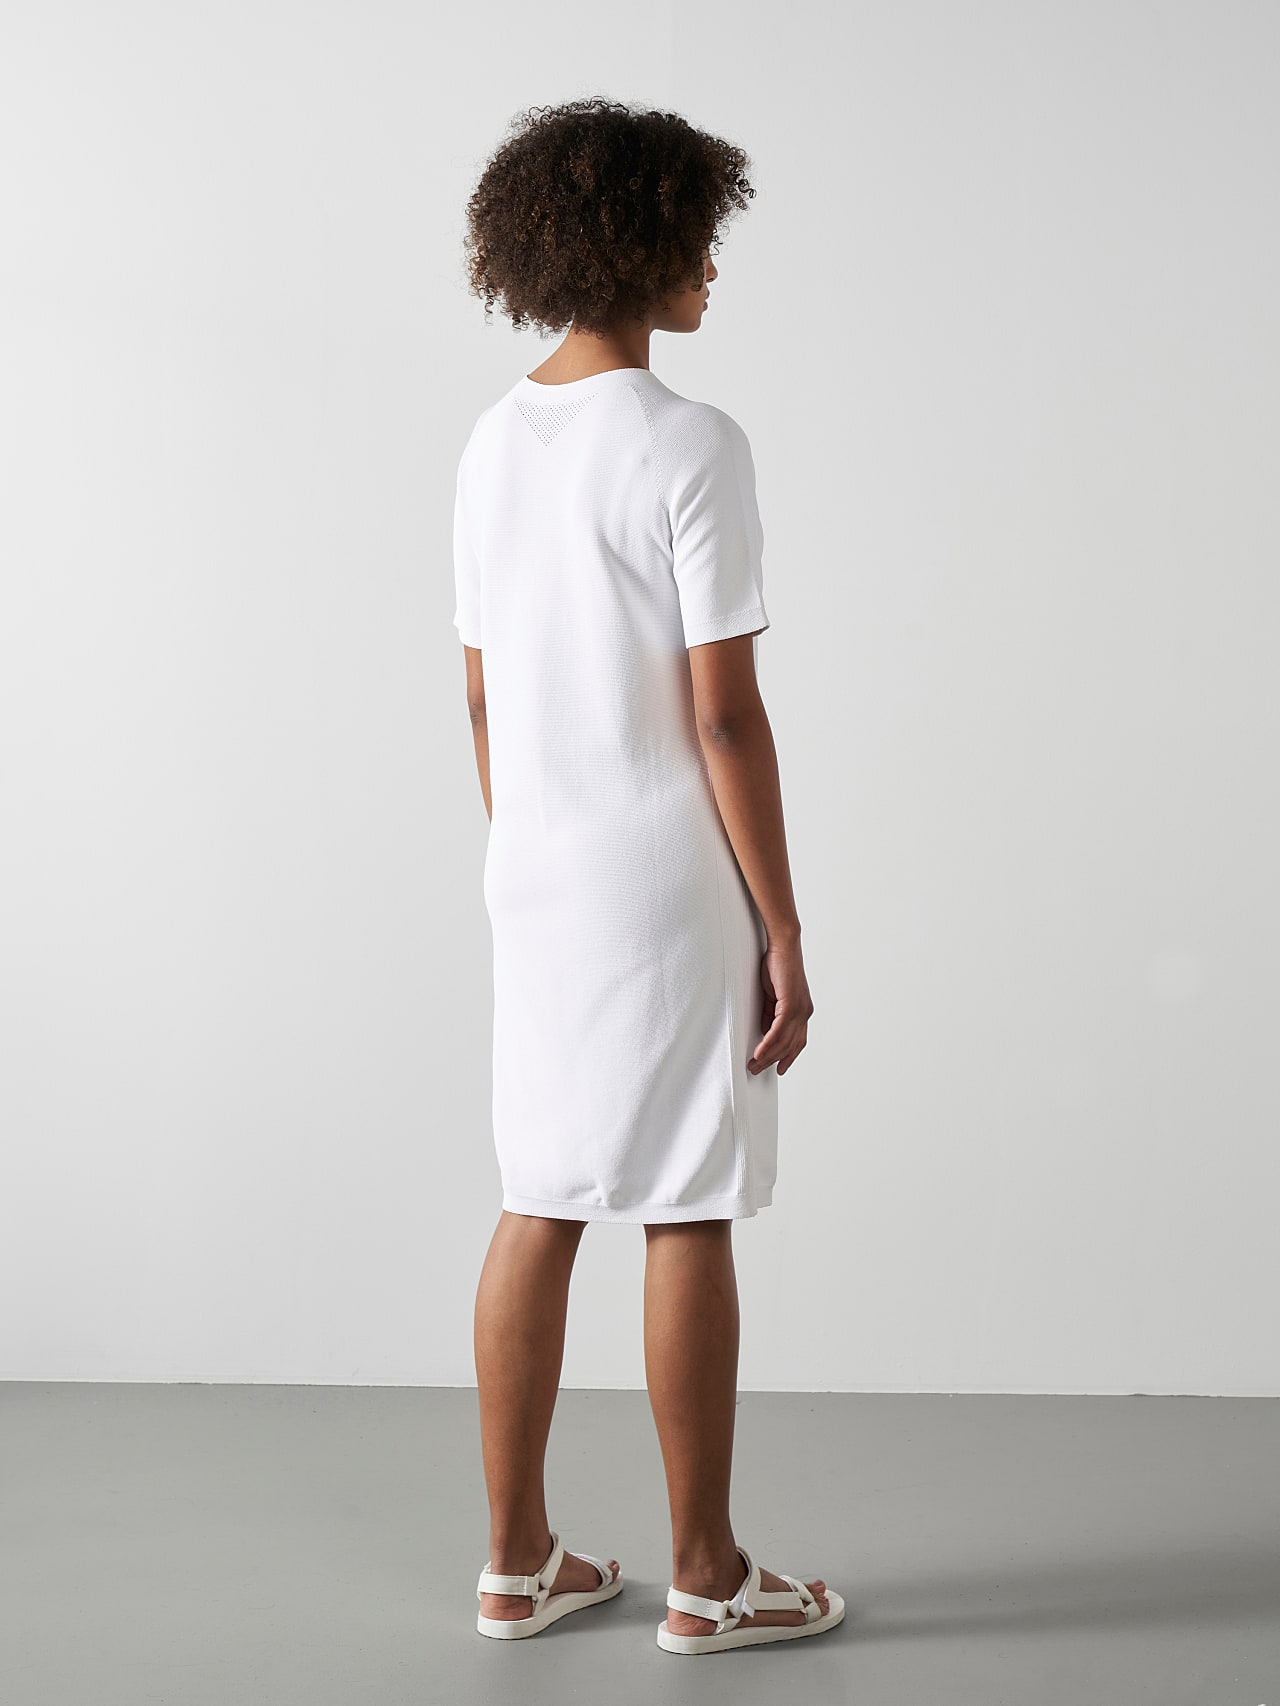 FZORF V1.Y5.01 Seamless Knit Dress white Front Main Alpha Tauri